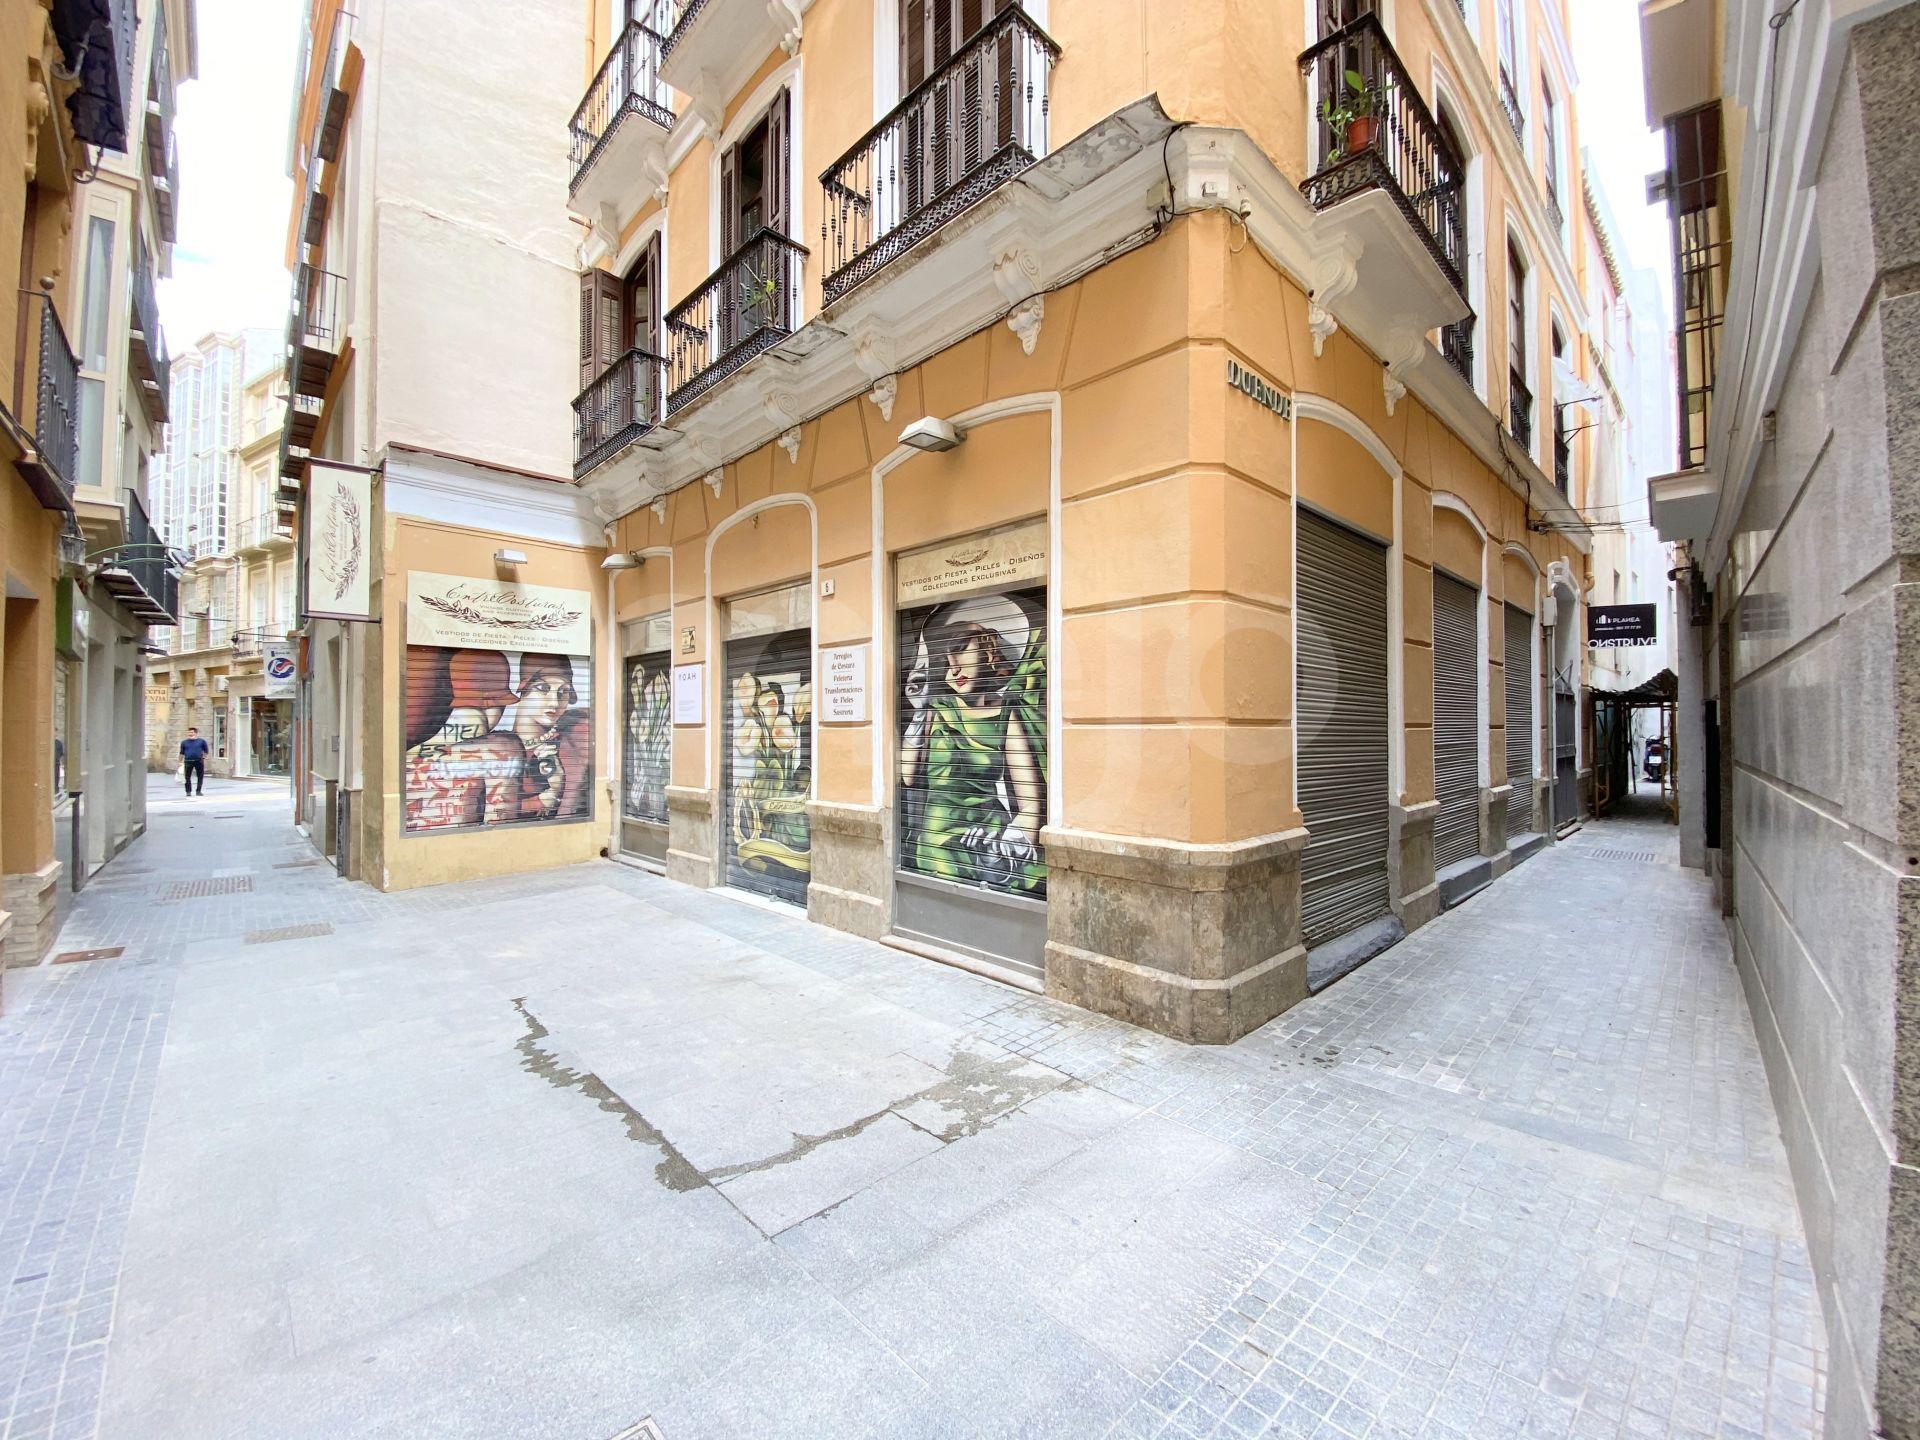 Edificio residencial en el casco histórico de Málaga